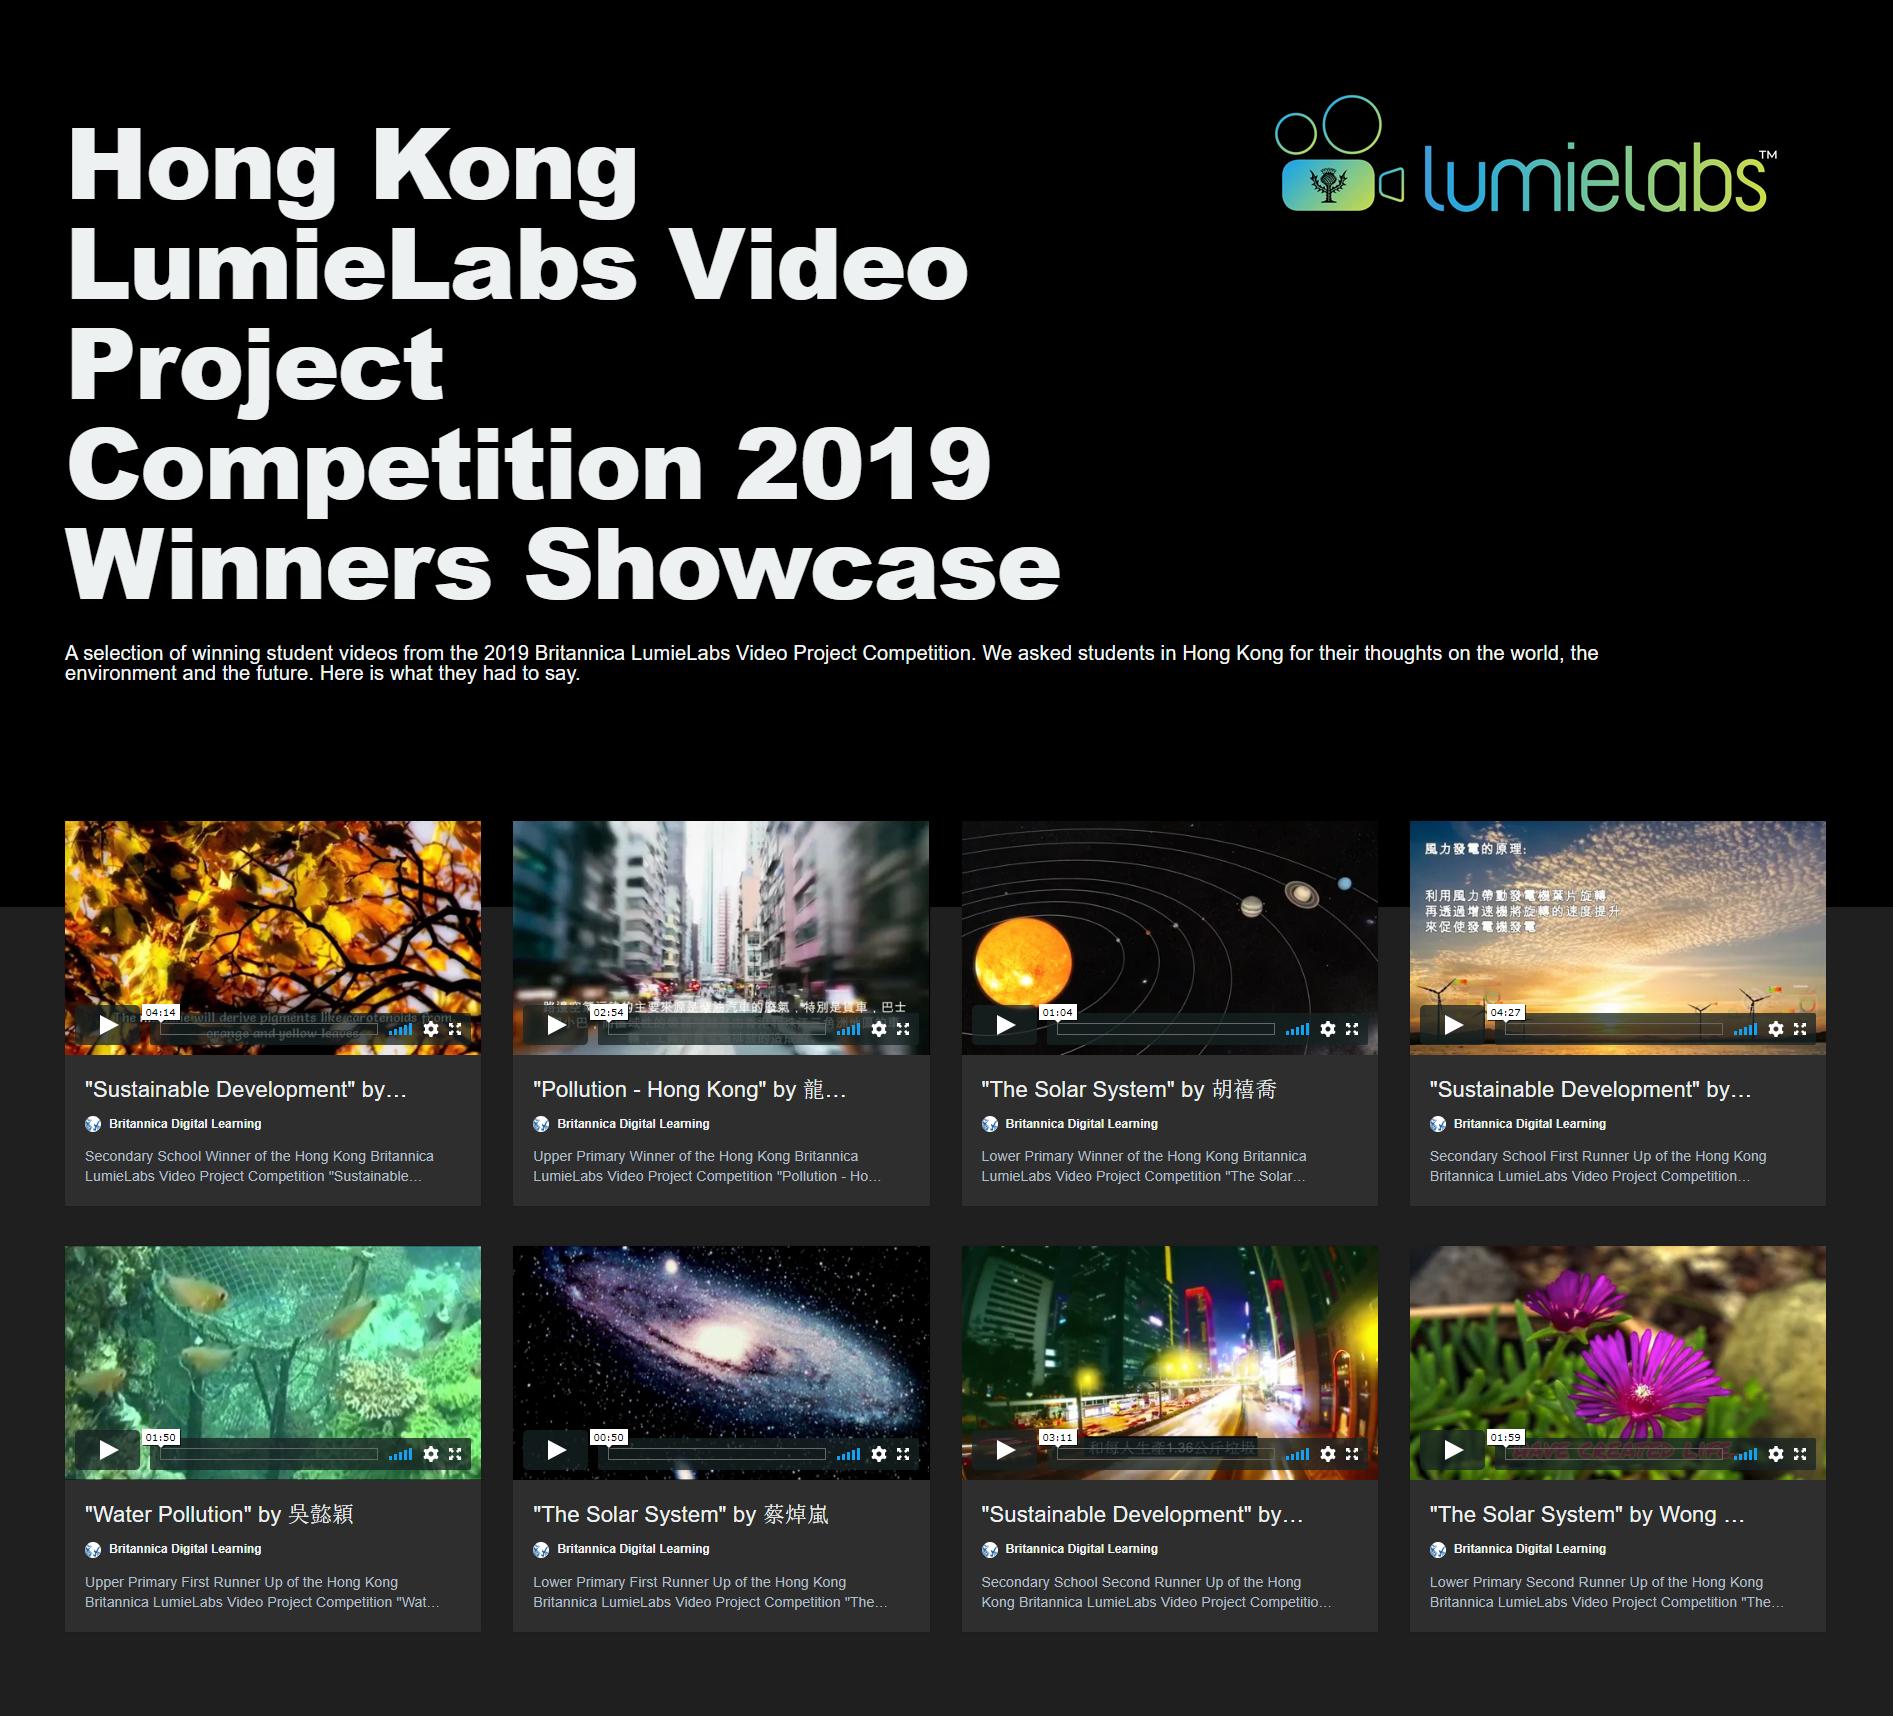 Winners Showcase